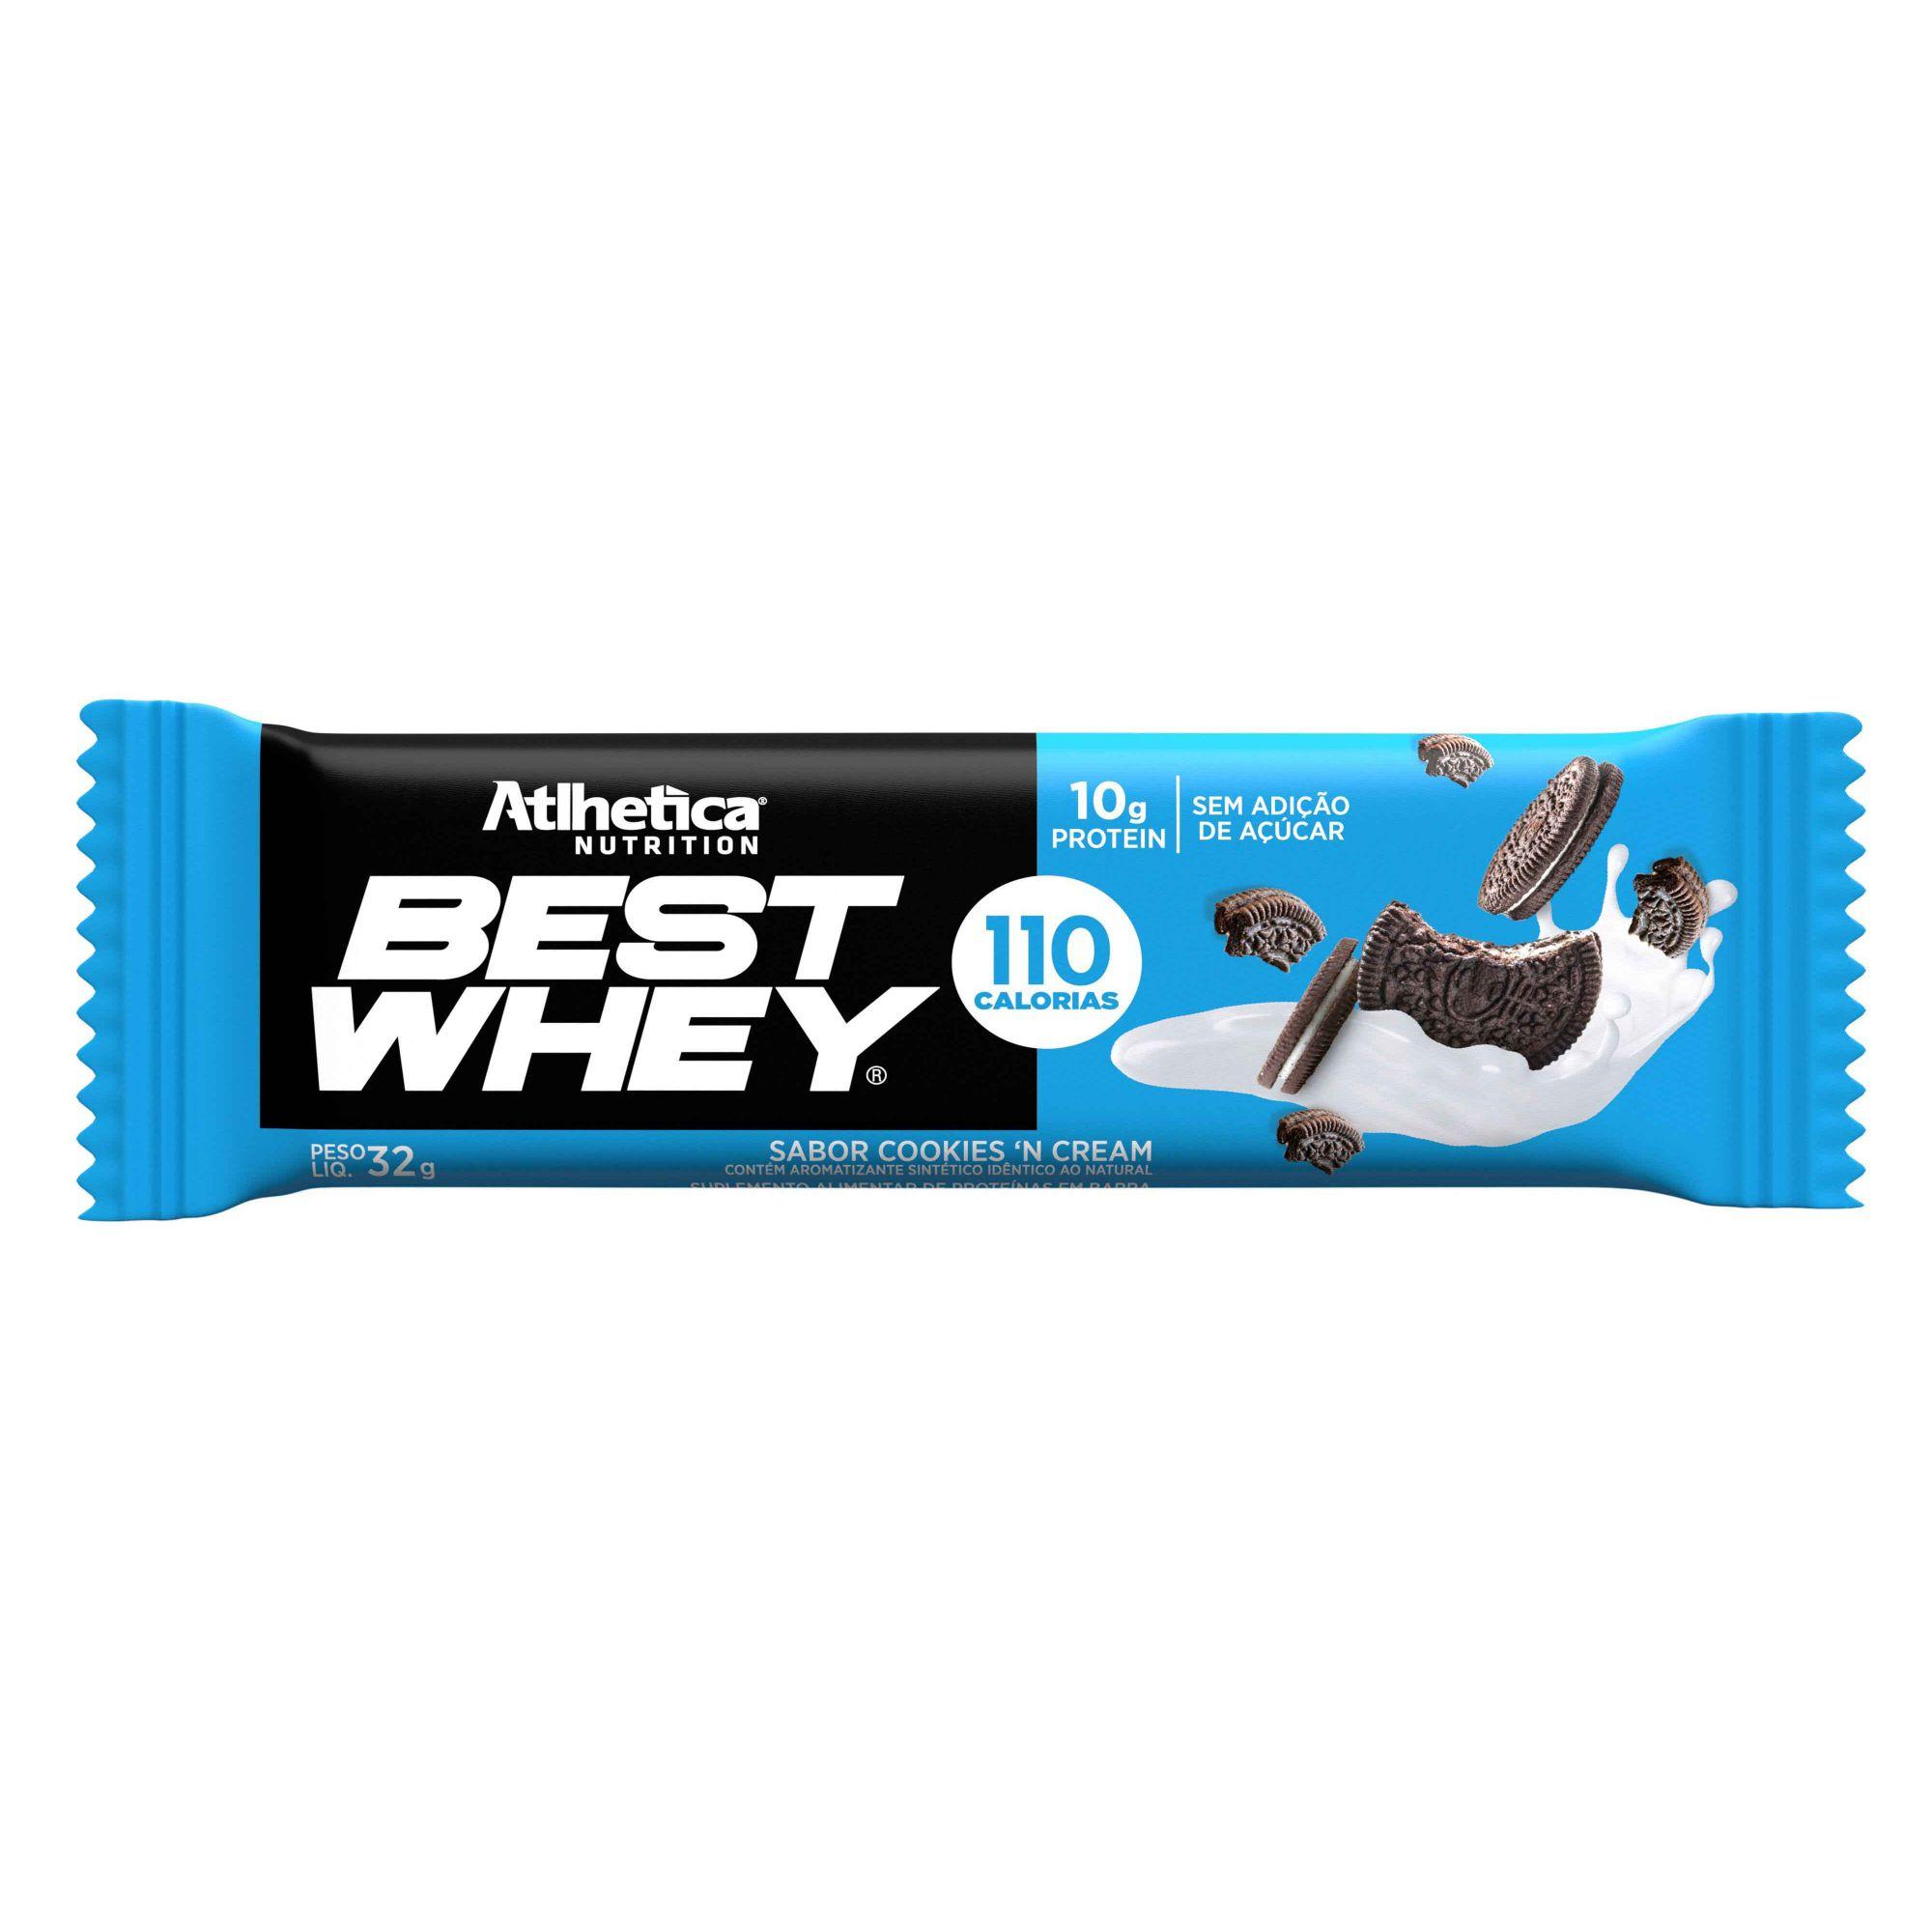 Best Whey Bar Uni. - Atlhetica Nutrition